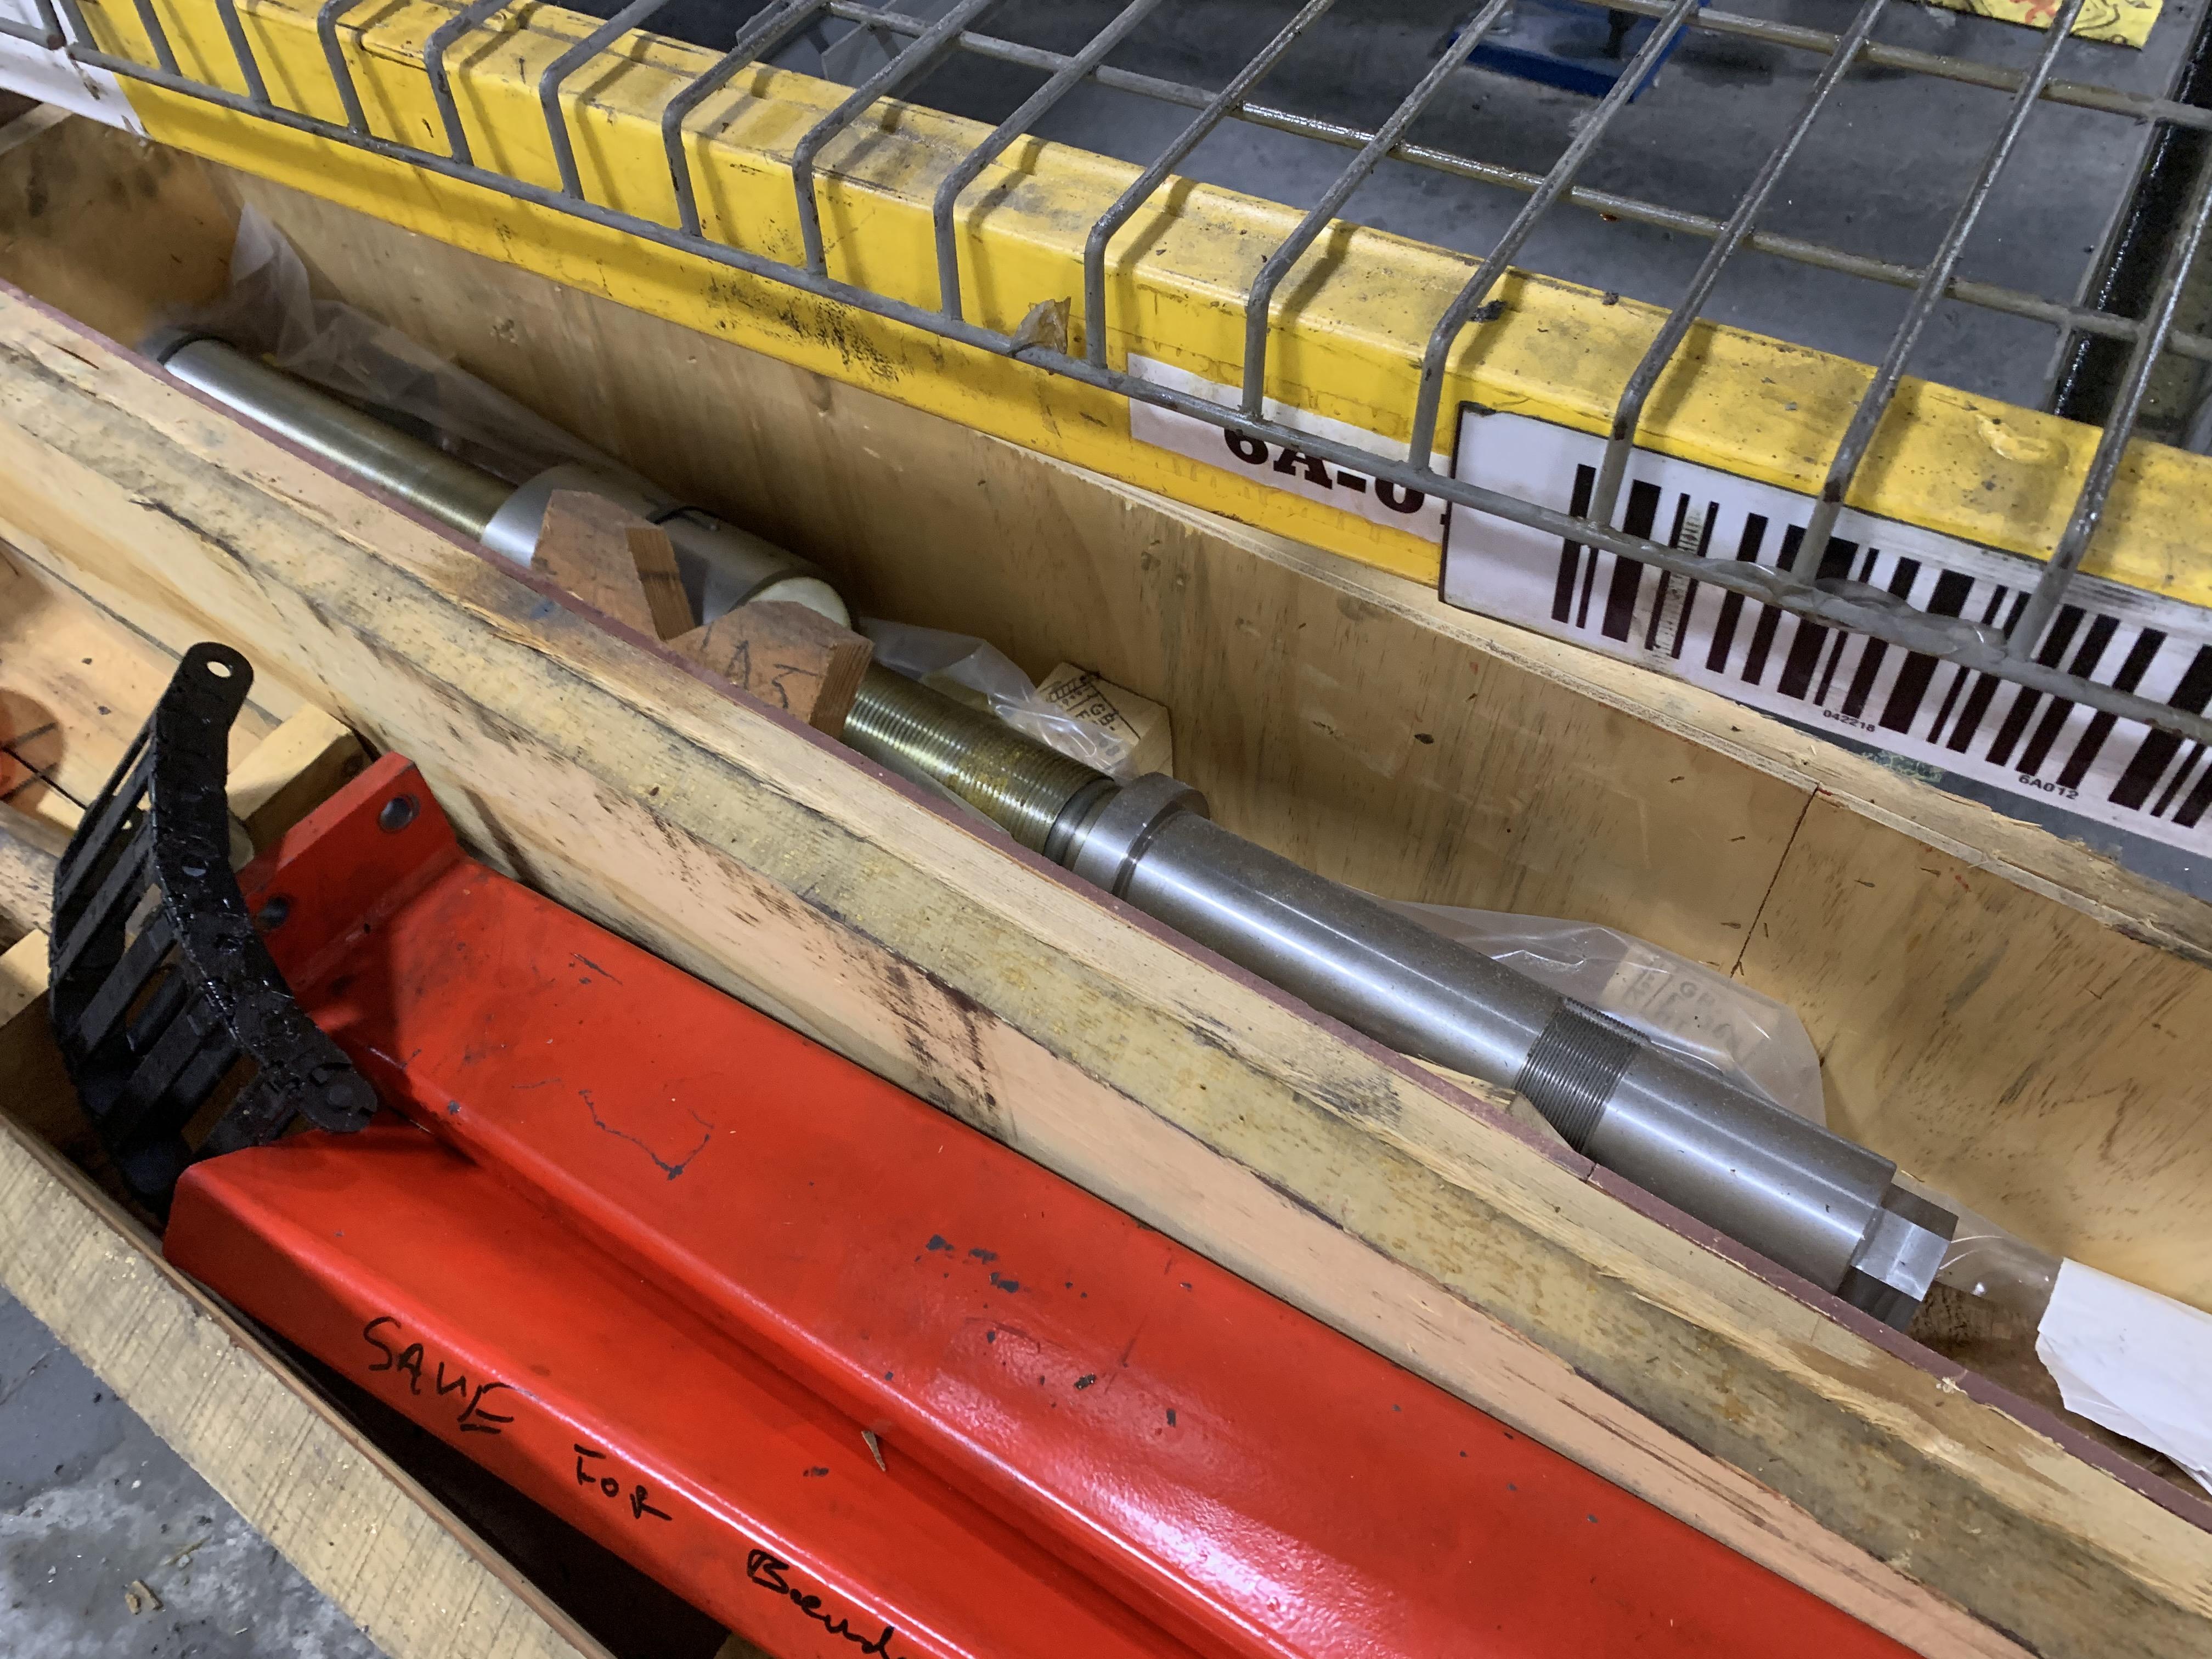 "6"" UNISON MODEL 6"" MS RH ELECTRIC CNC MULTI-STACK TUBE BENDER; S/N 2715, JOB NO. ME 4-410,(NEW 2014) - Image 66 of 72"